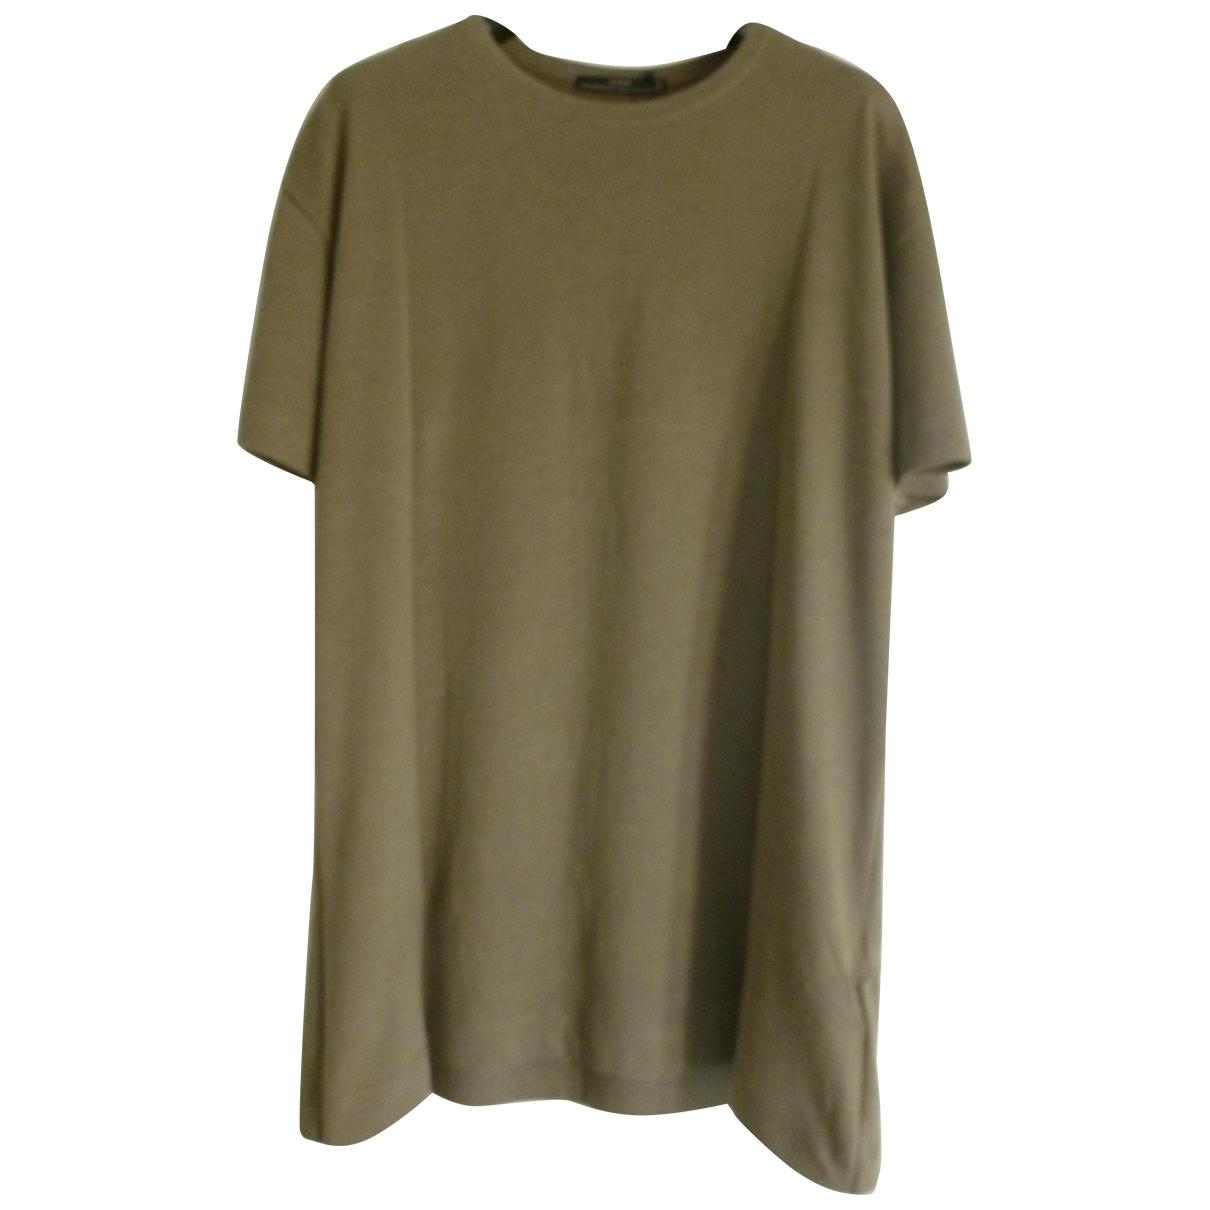 Zara \N Khaki Cotton  top for Women S International